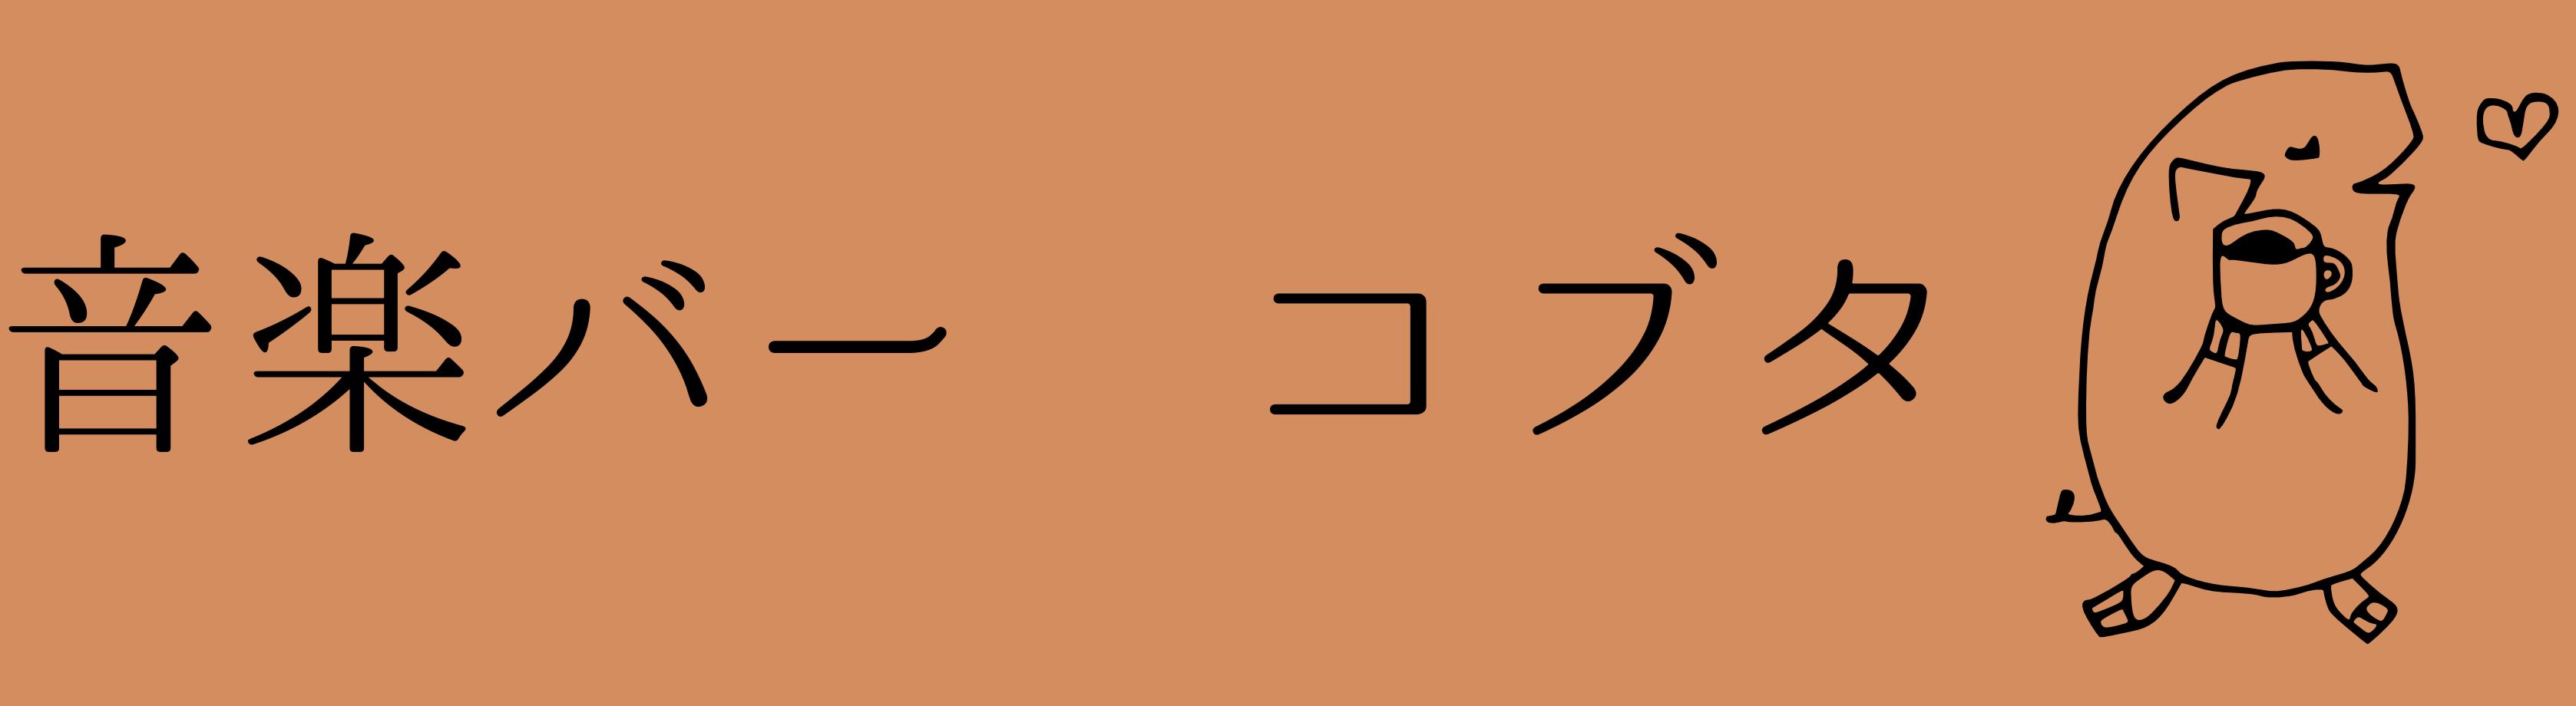 kobuta5